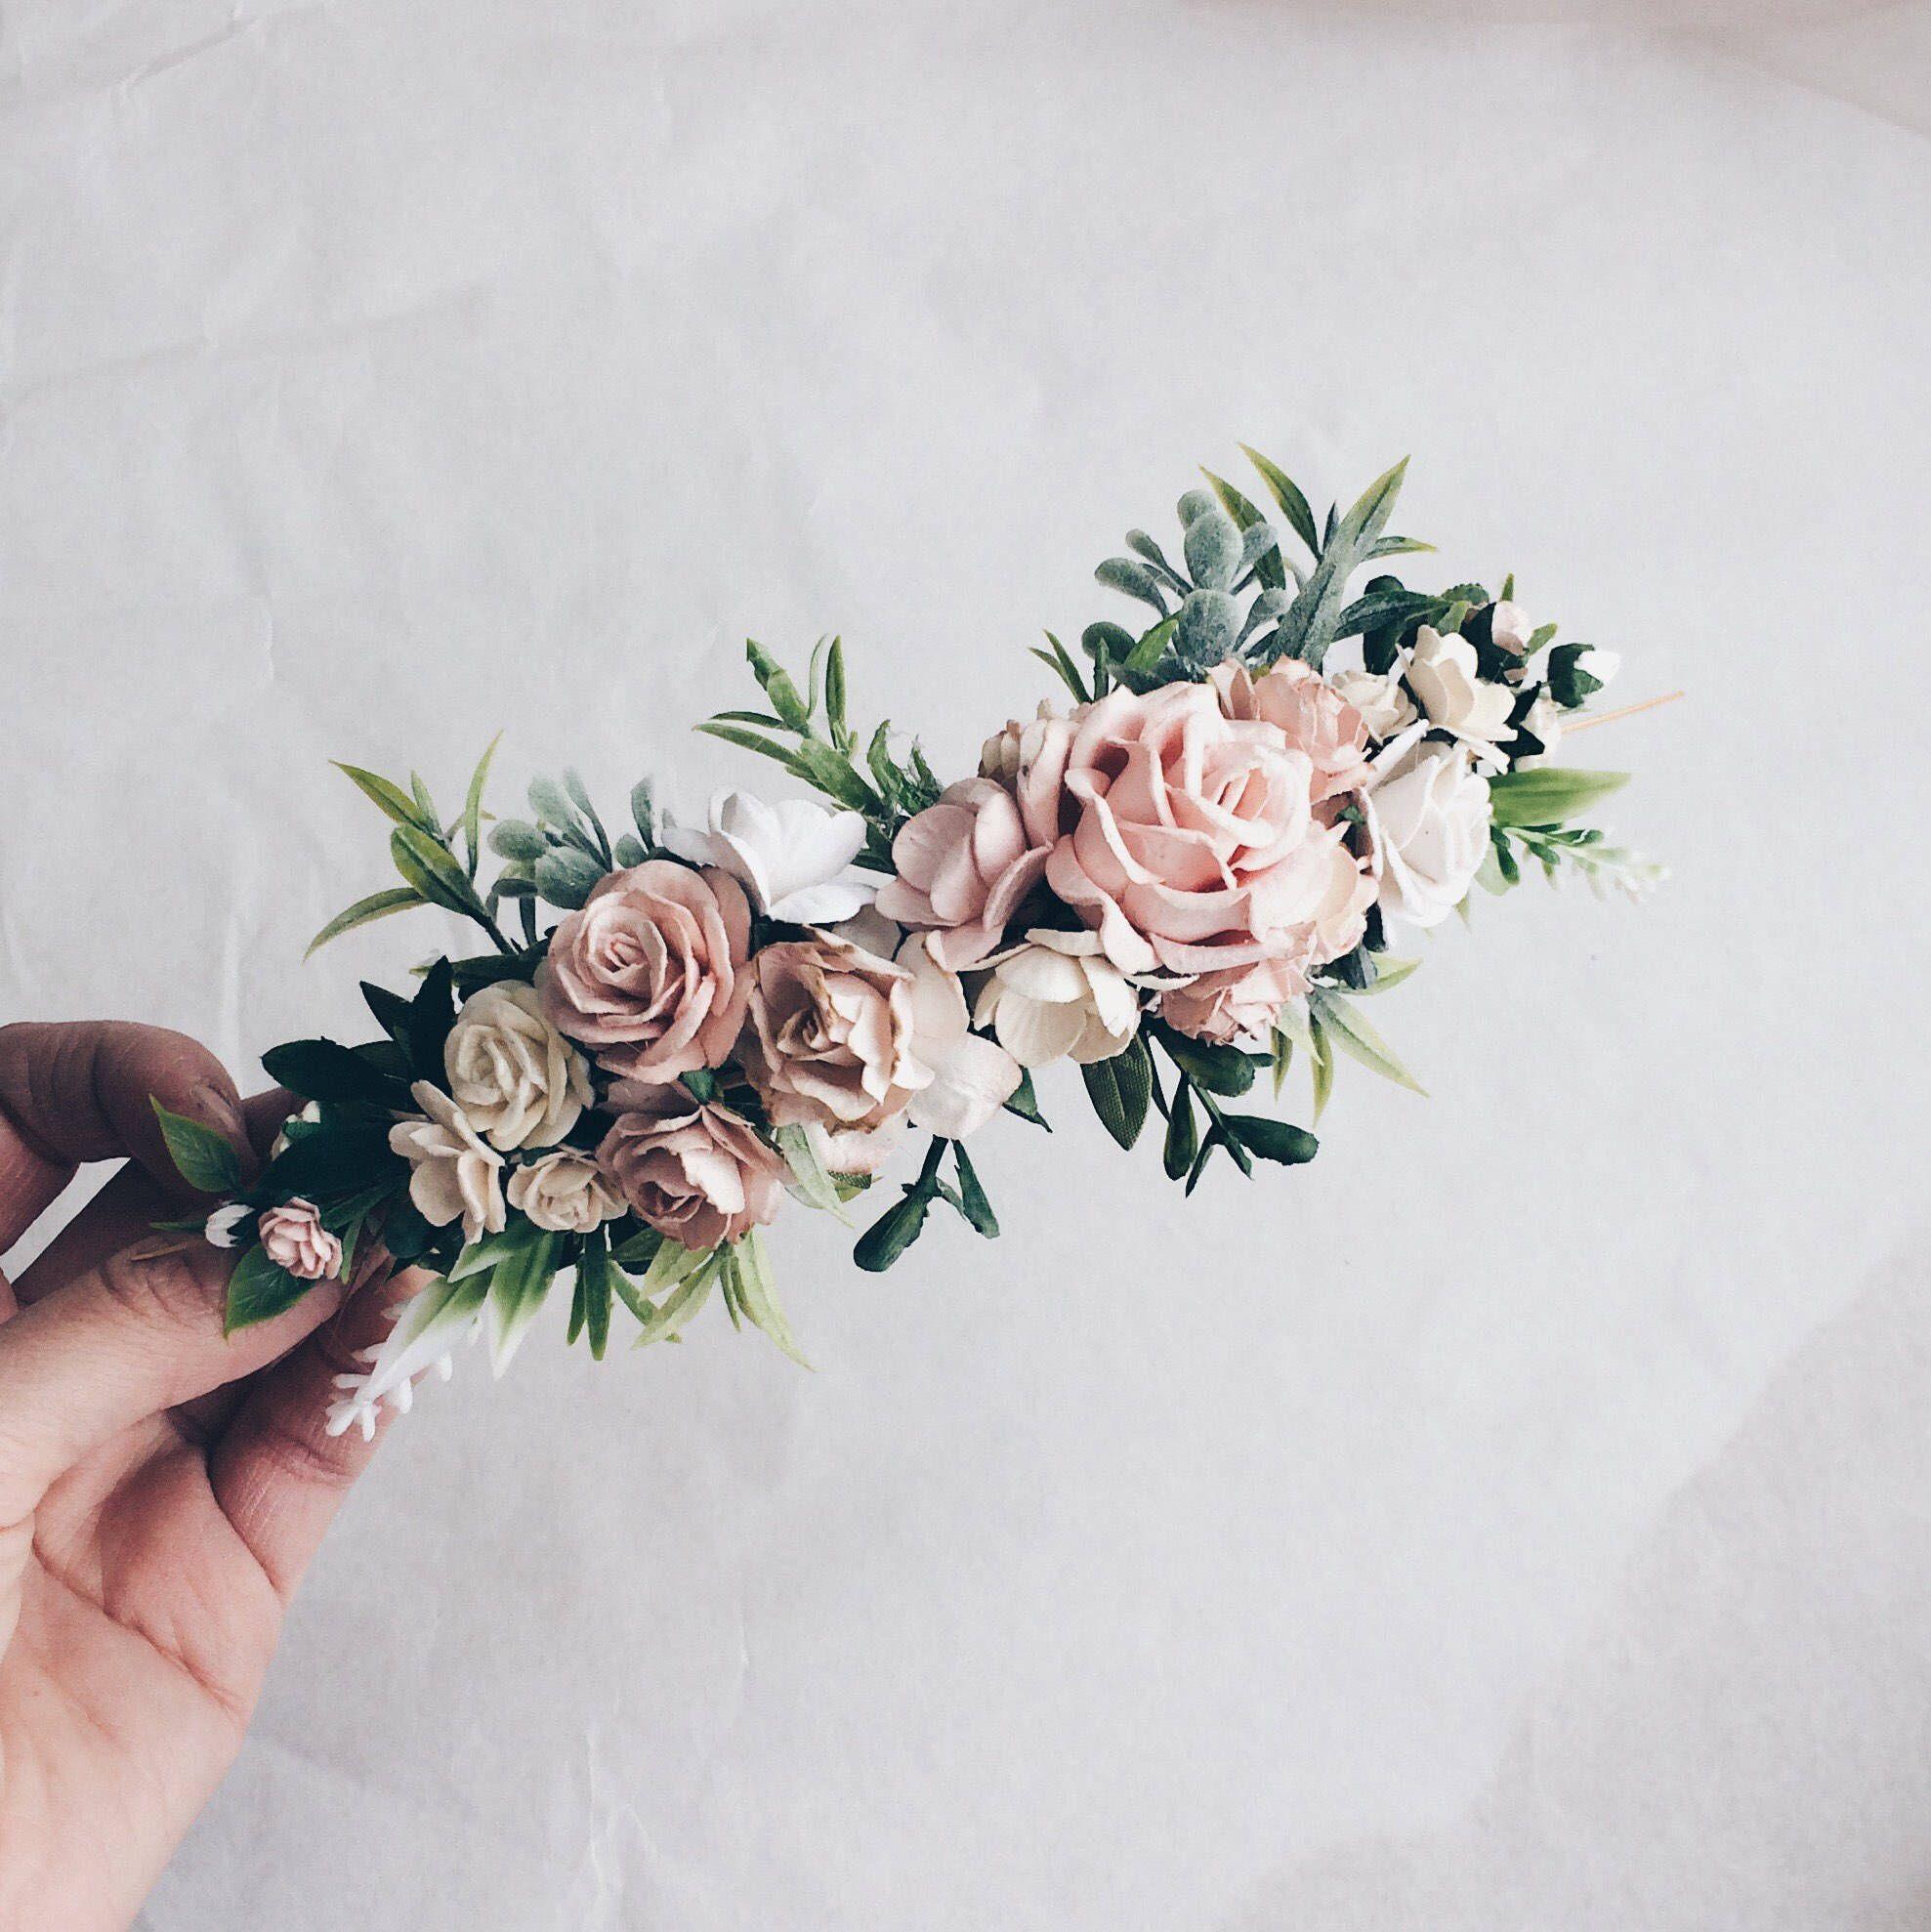 Pale pink and white and grenery headpiece, floral hair piece, pale pink hair clip, bridal hair piece, blush pink quarter wreath, bri #bridalhair